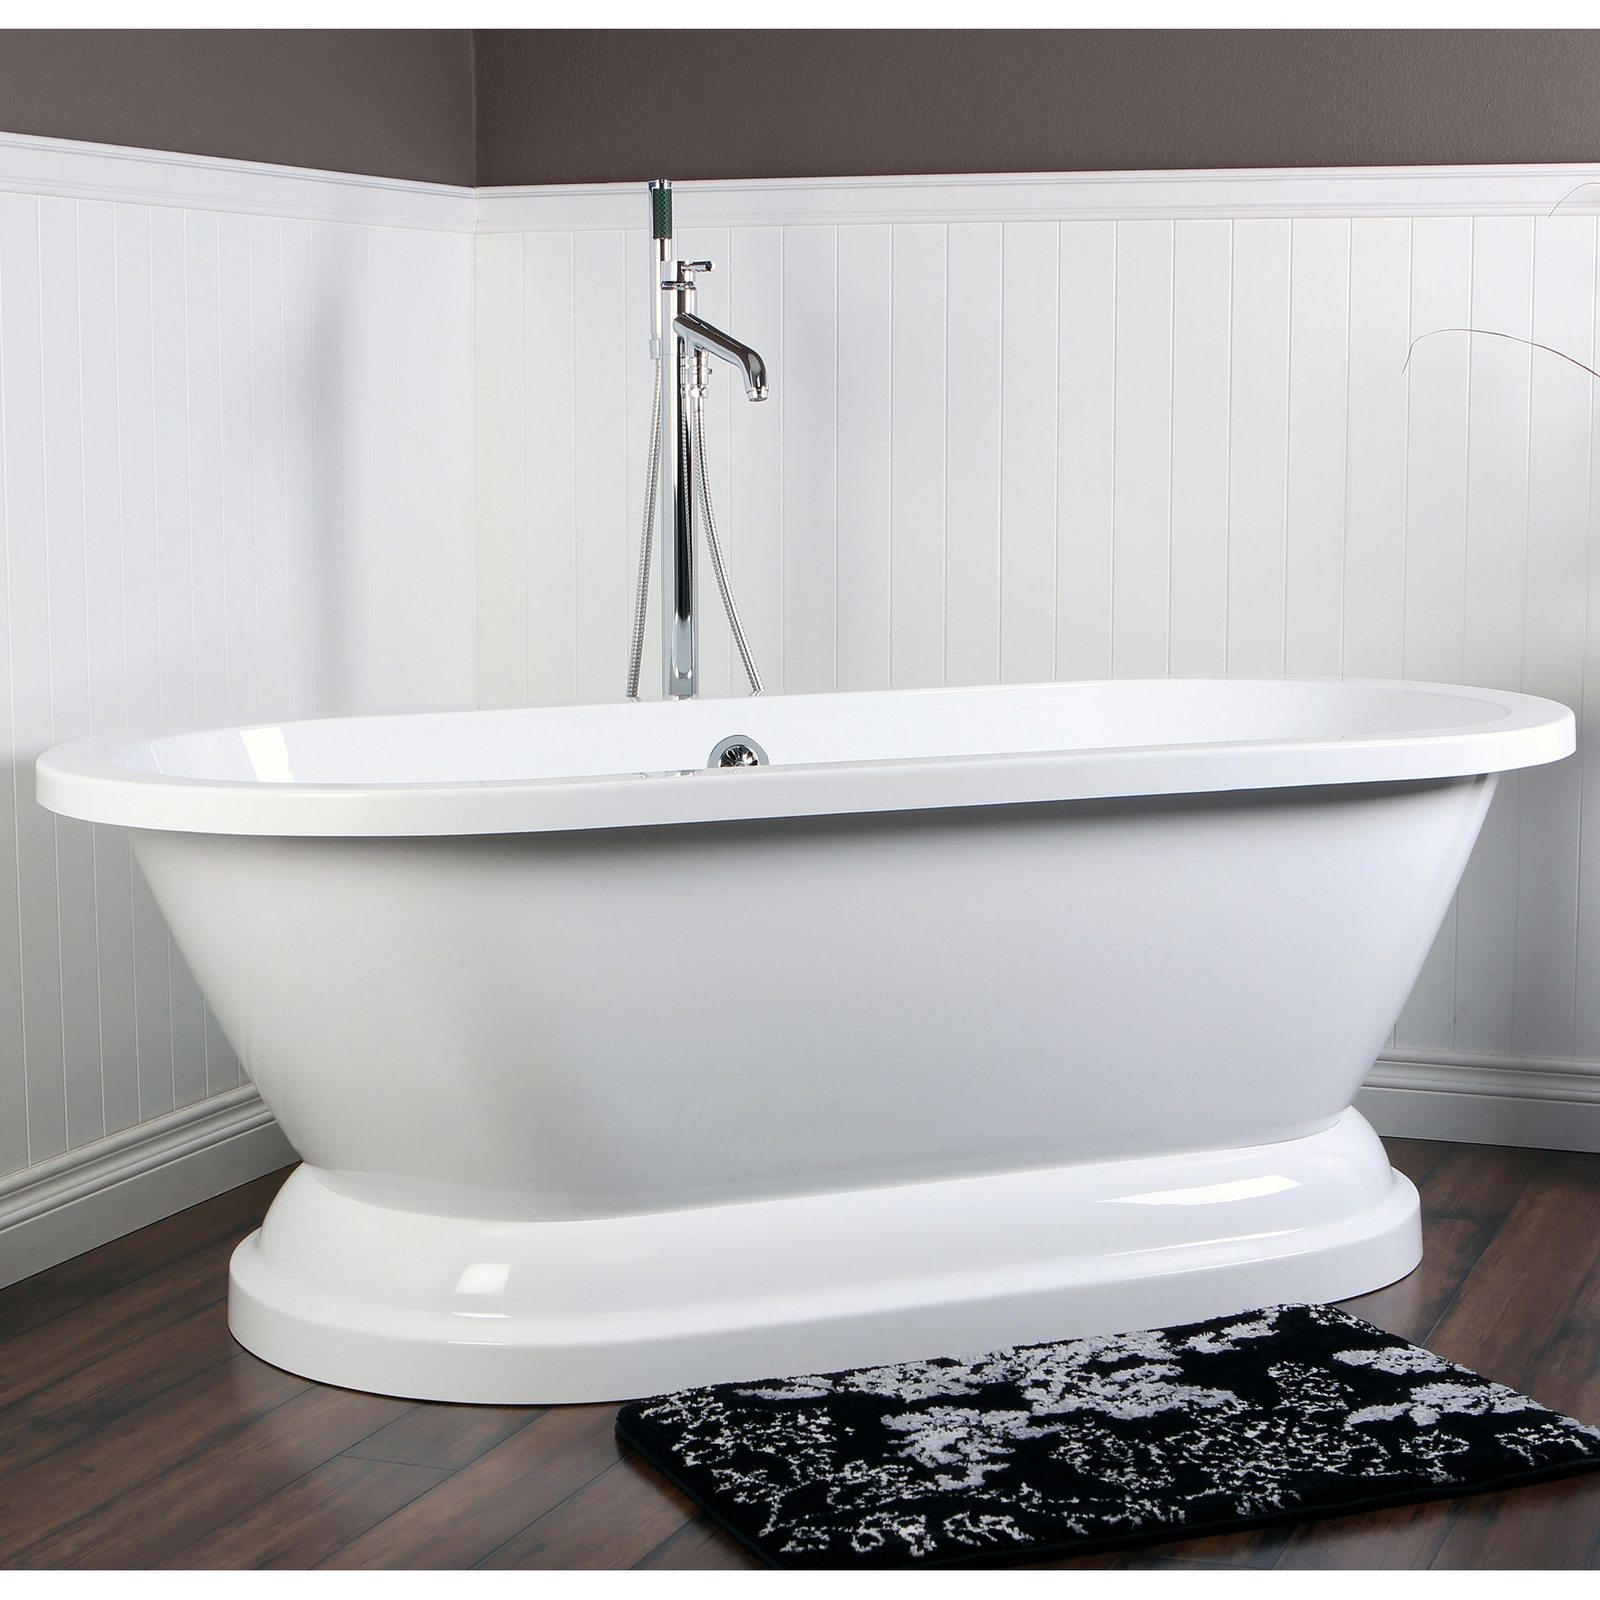 Acrylic Pedestal Bathtub Free Standing and 50 similar items